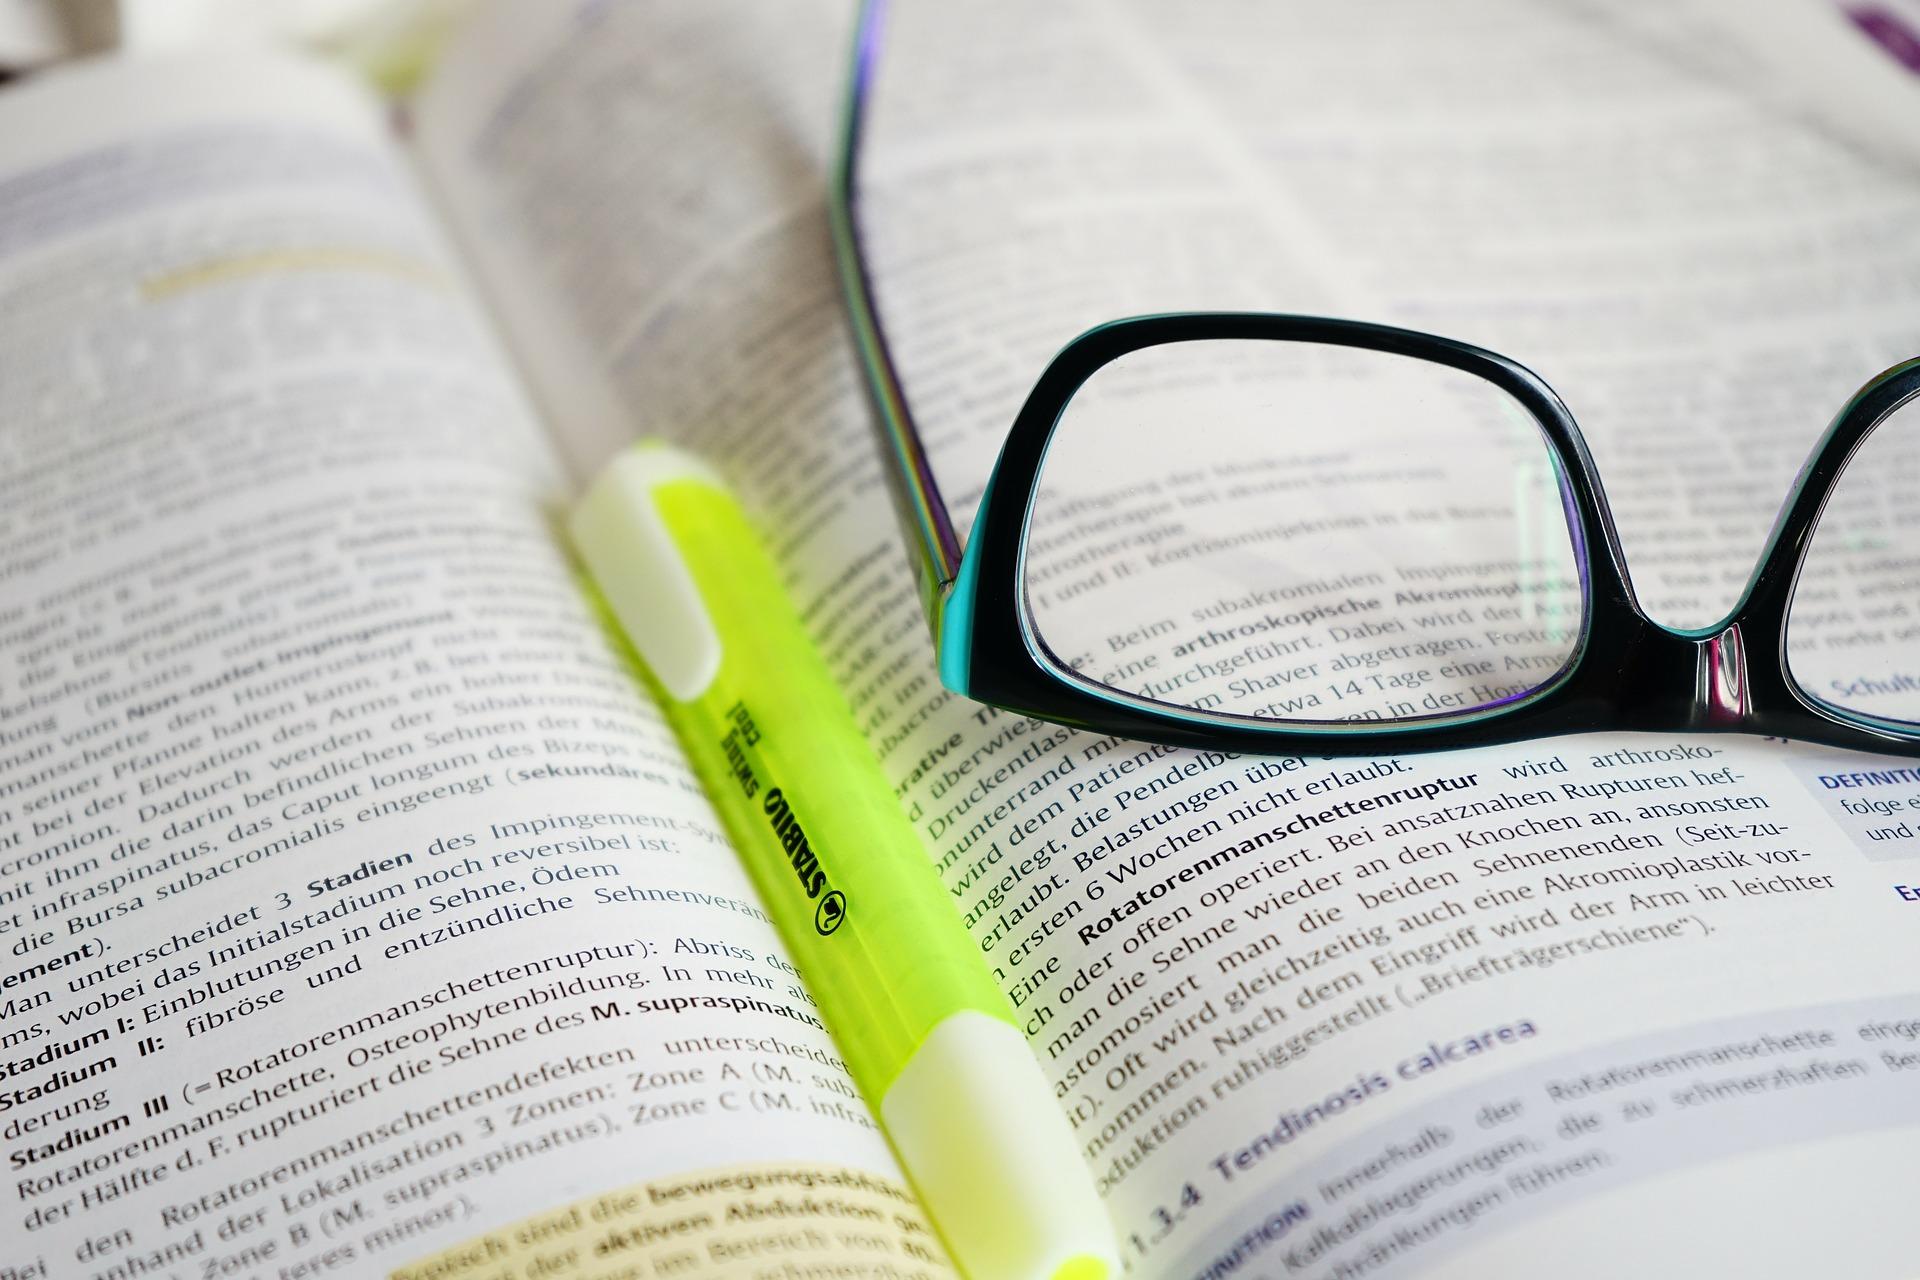 glasses-highlights-pixabay-272399_1920